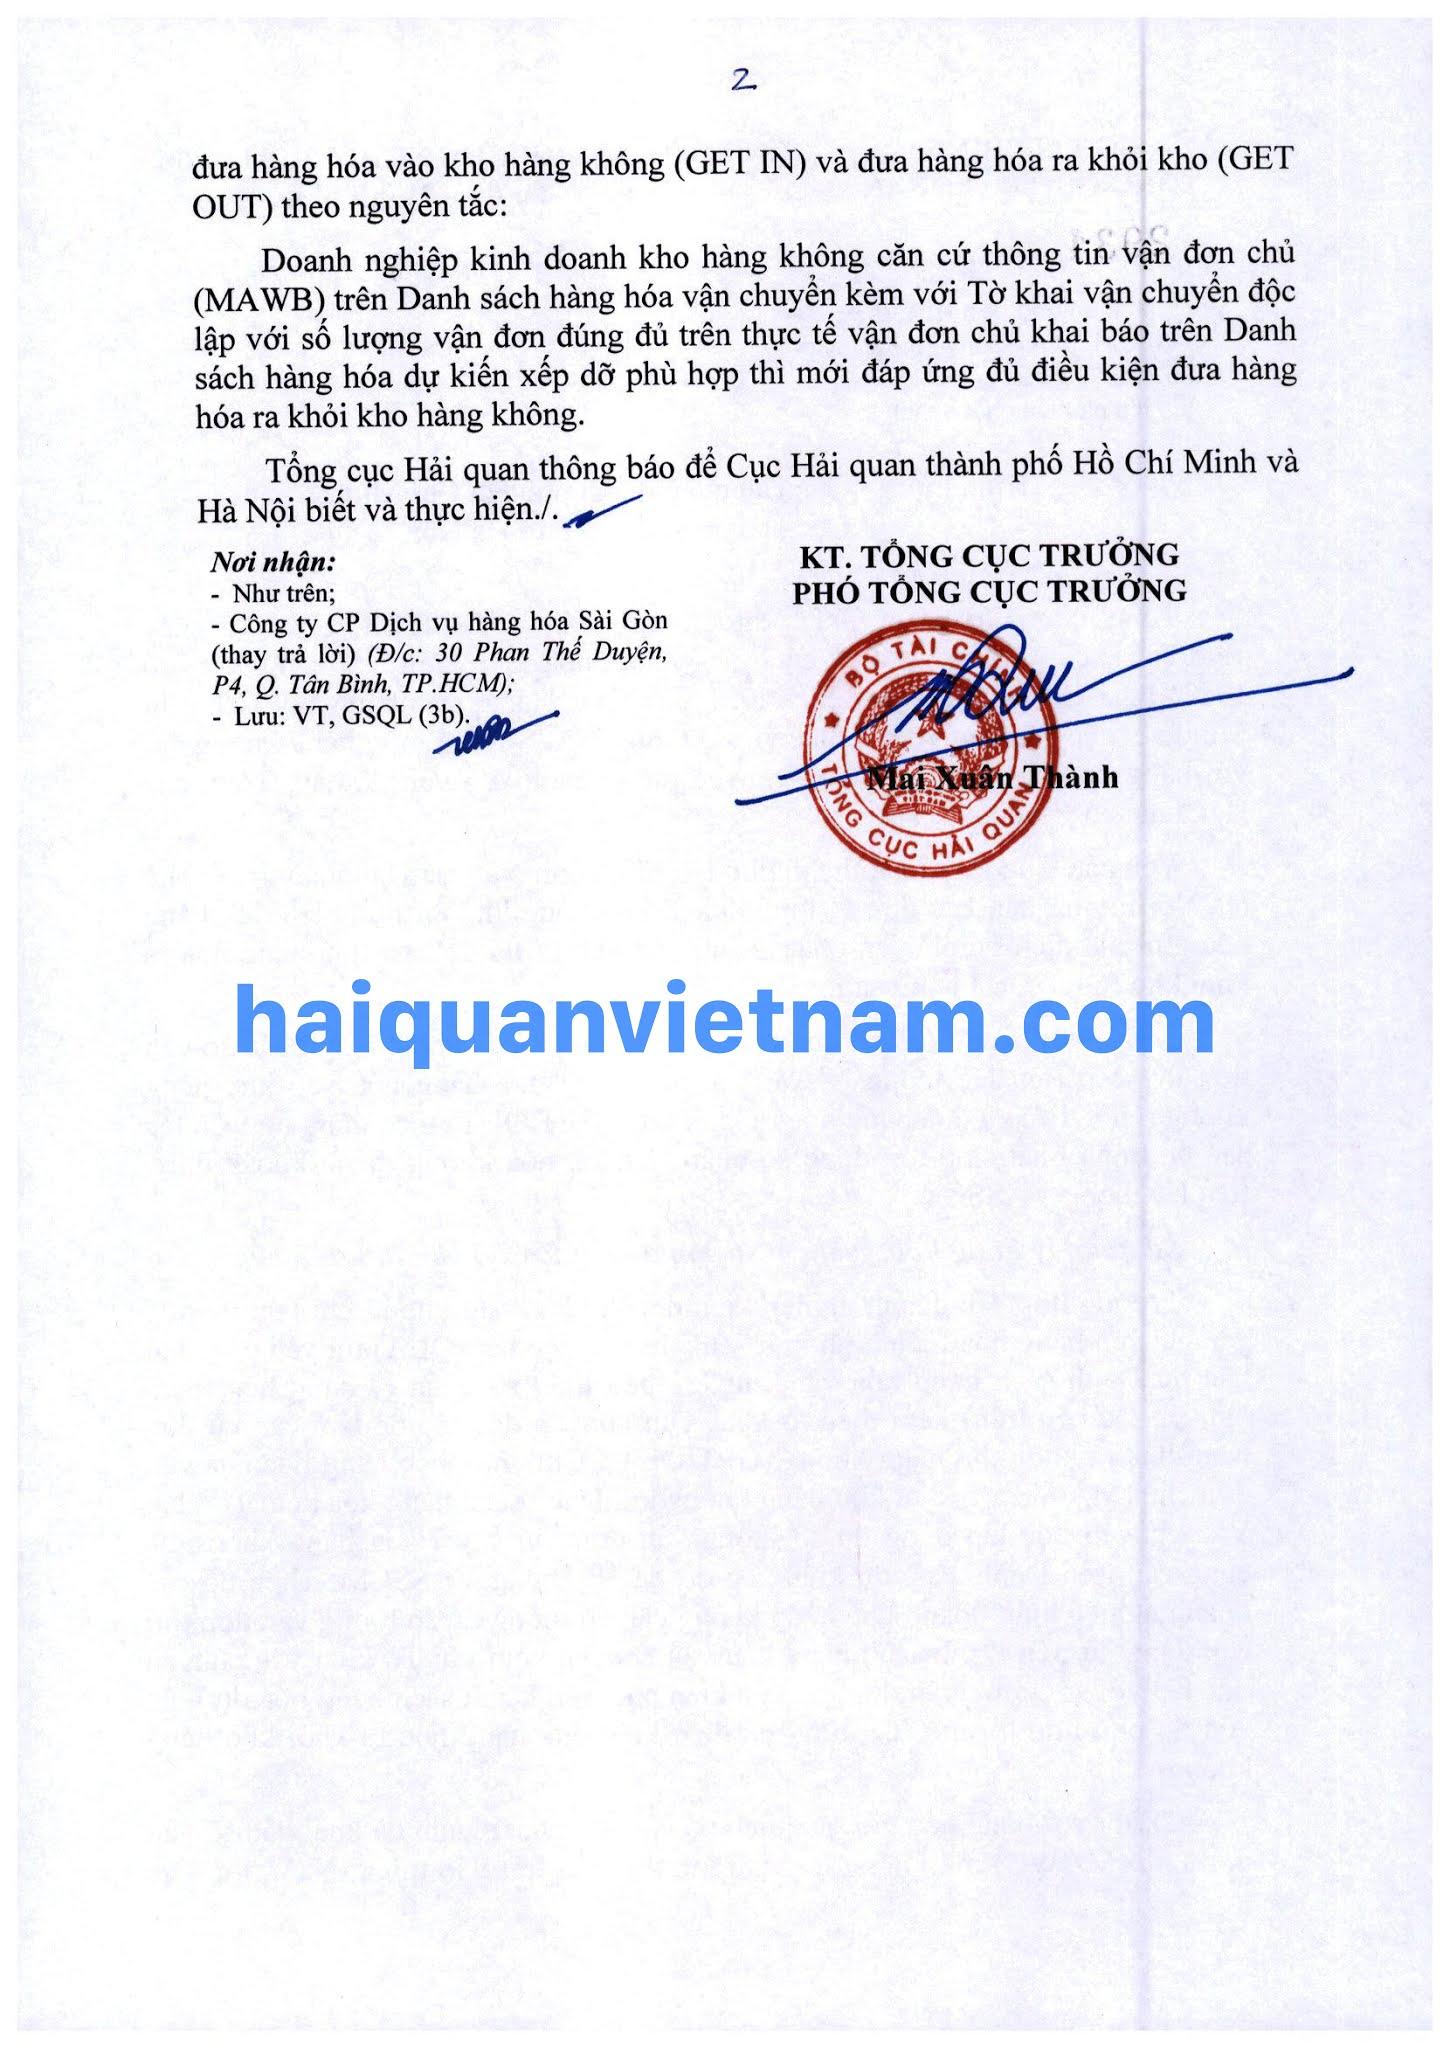 [Image: 210615_2934_TCHQ-GSQL_haiquanvietnam_02.jpg]